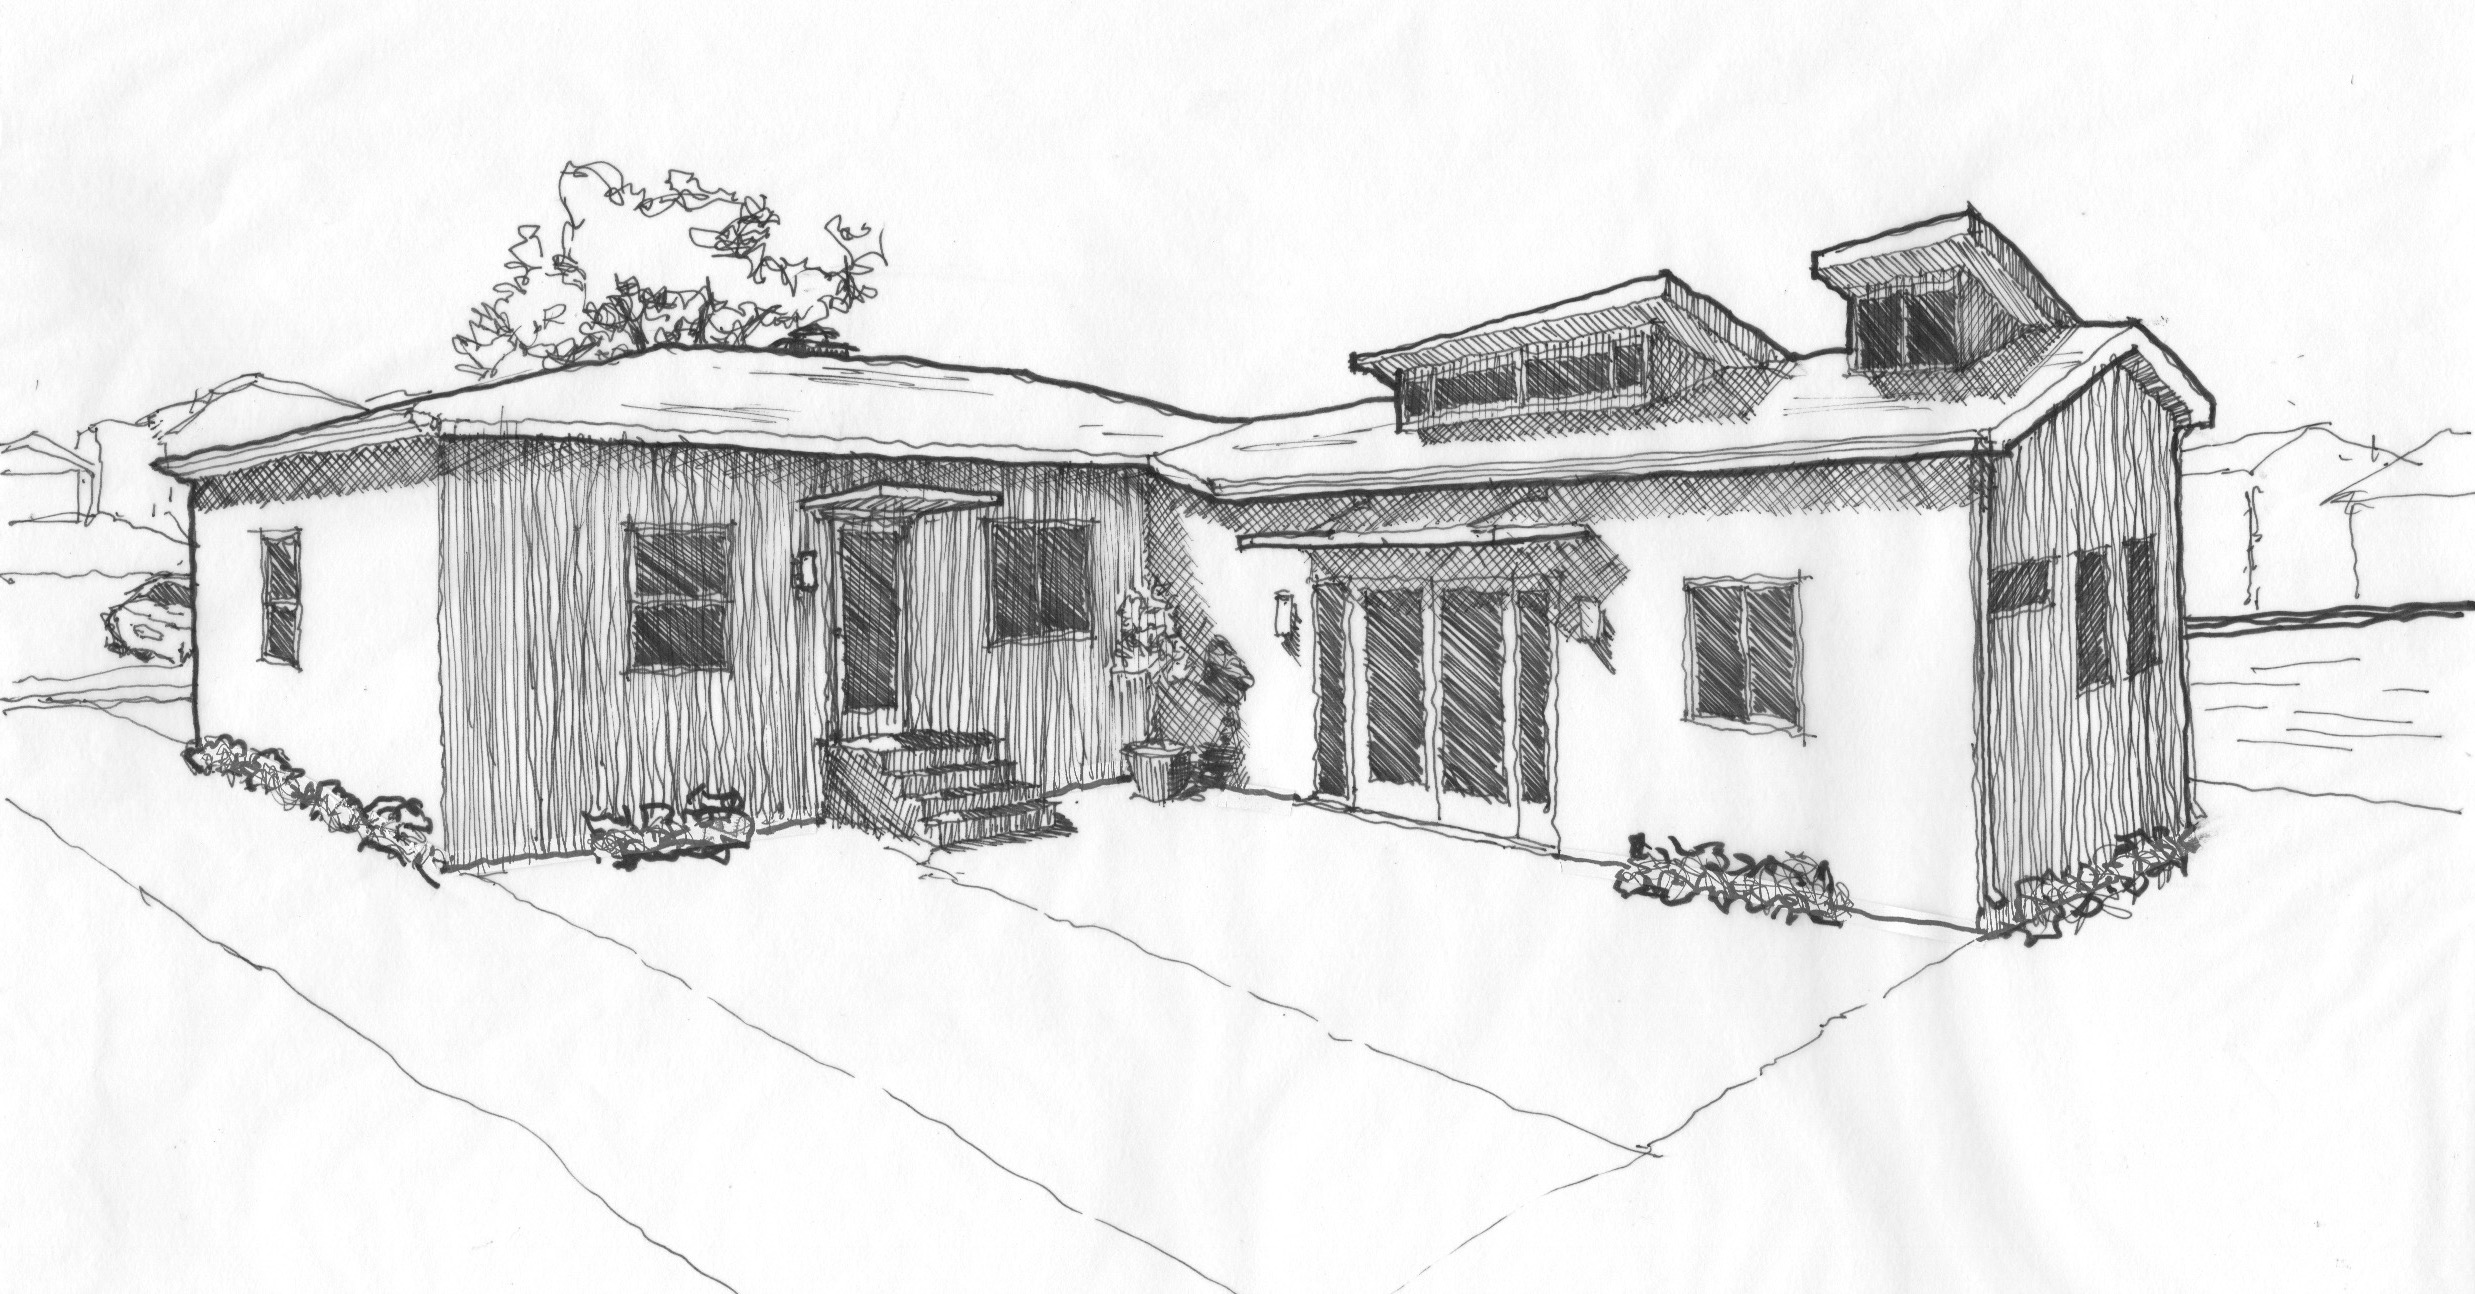 Proposed Design Sketch